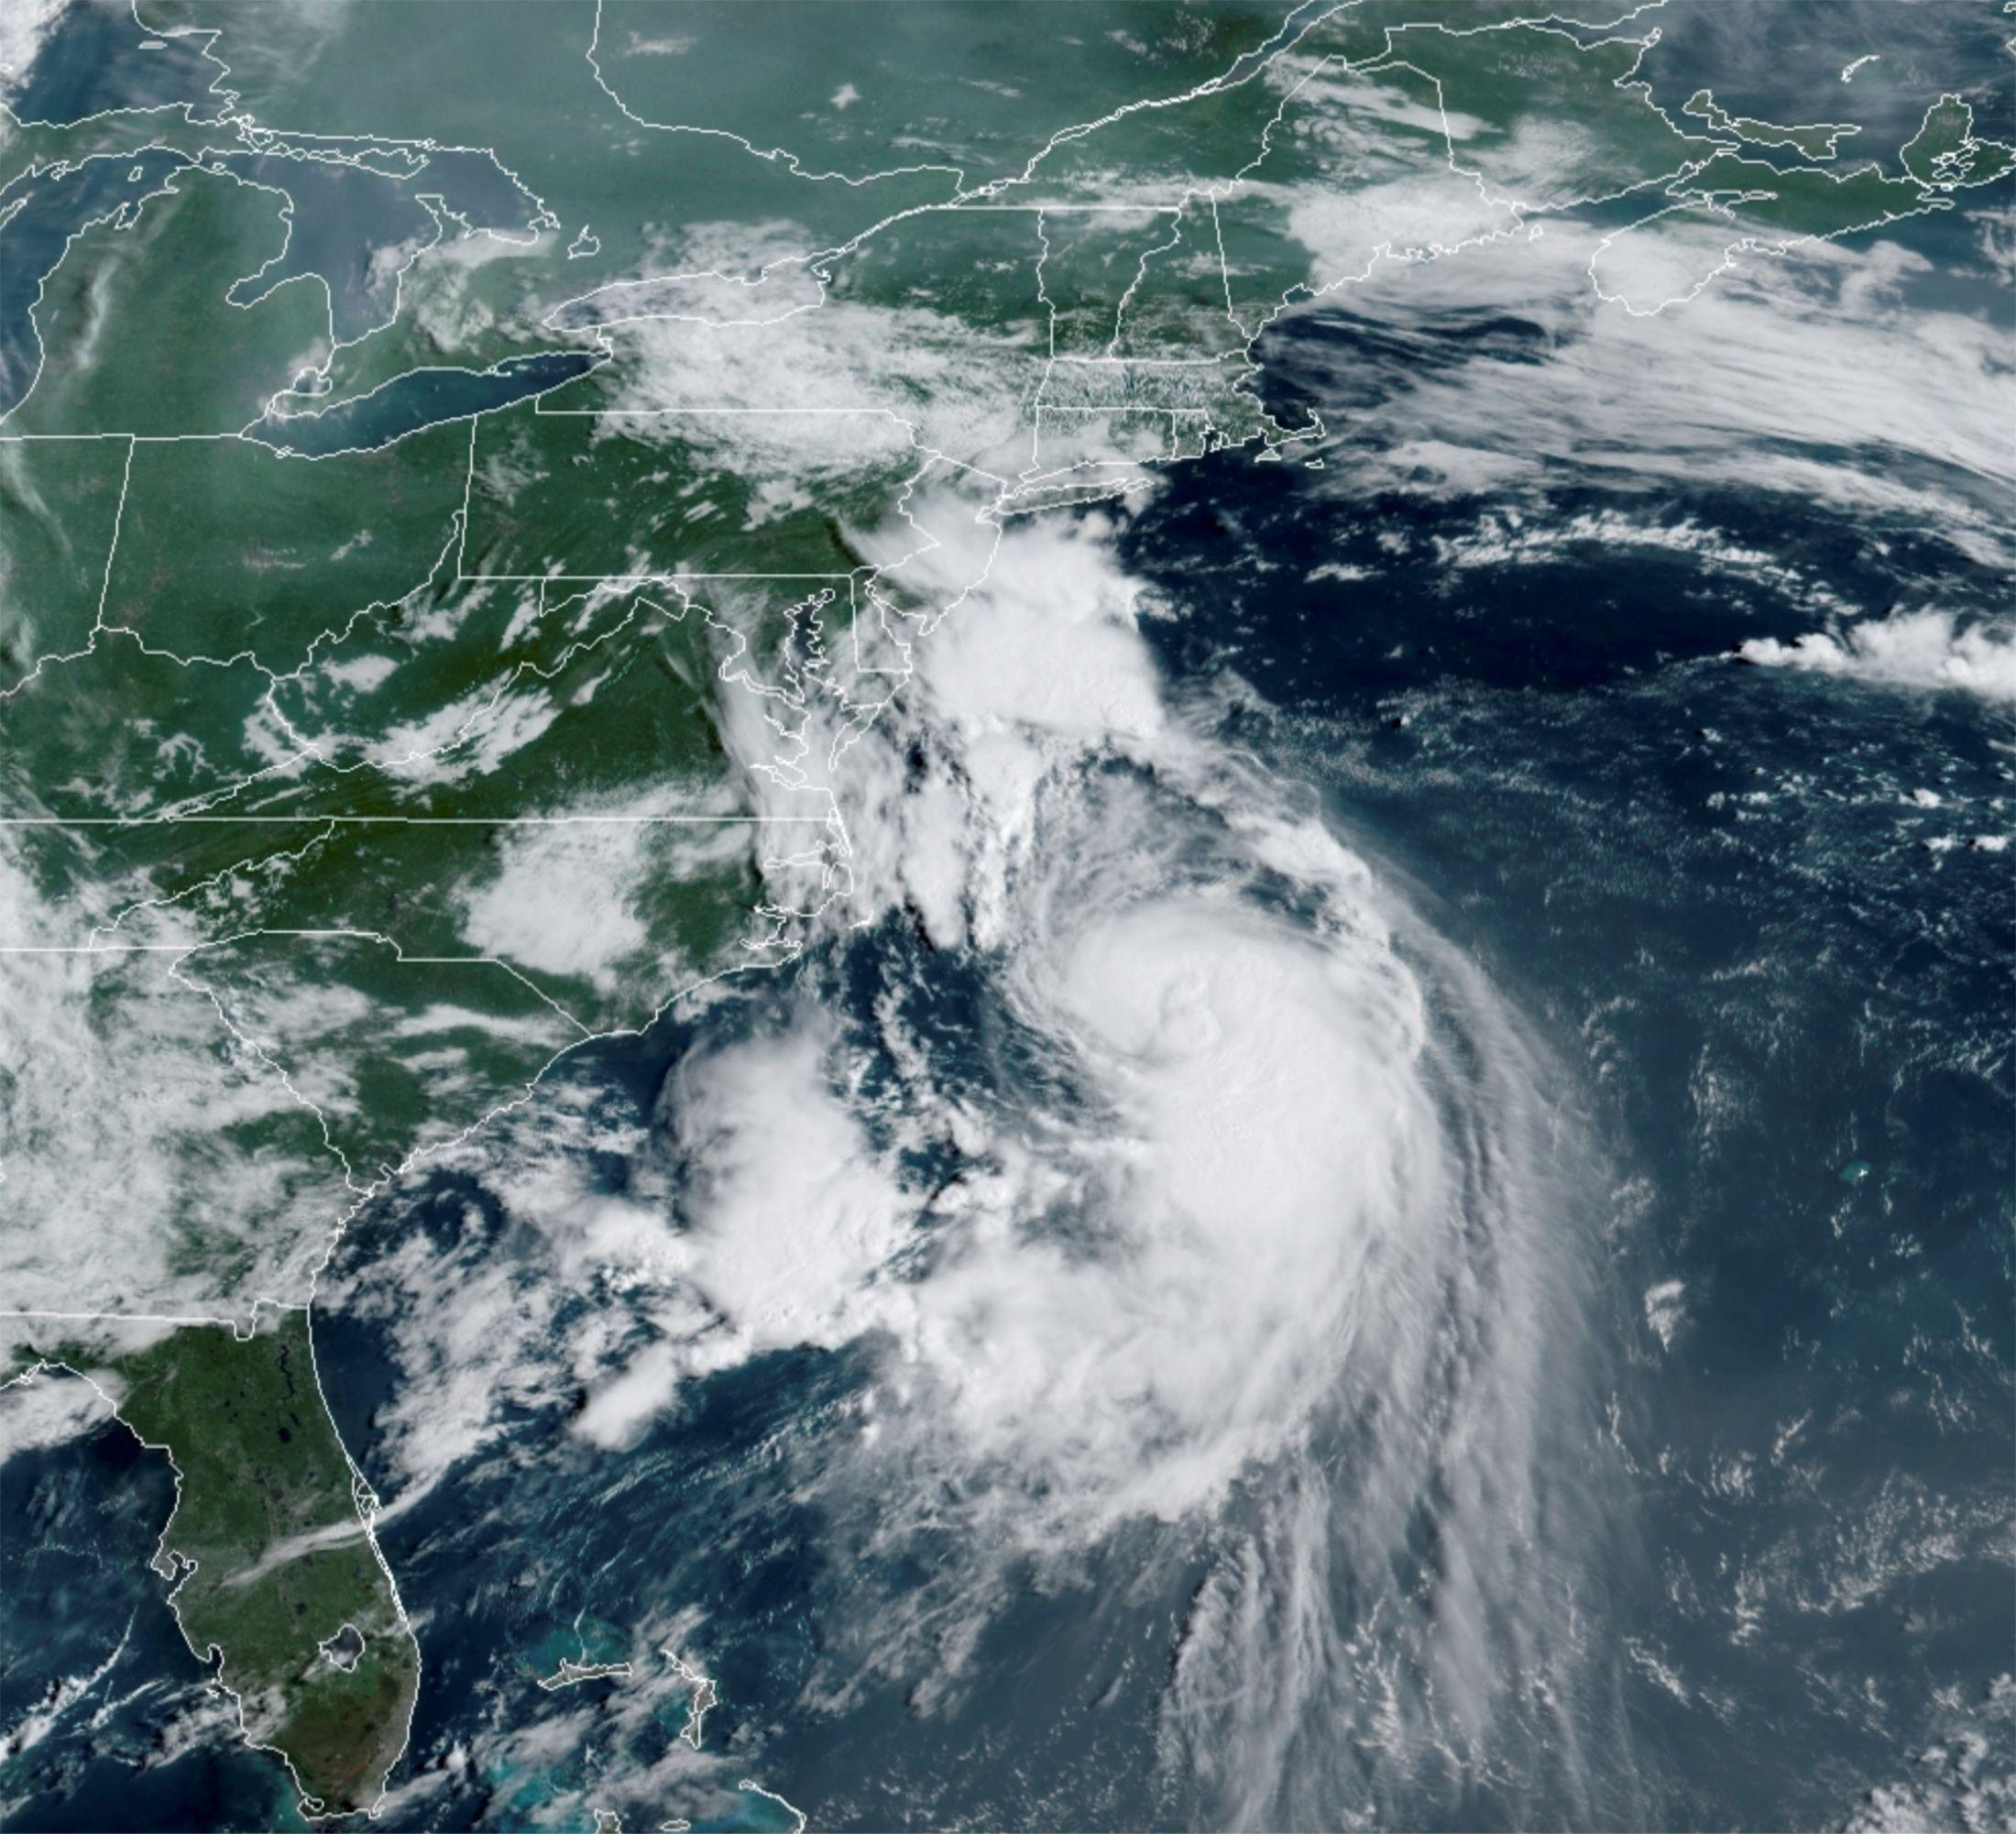 La tormenta Henri se convirtió en huracán (NOAA/Handout vía REUTERS)